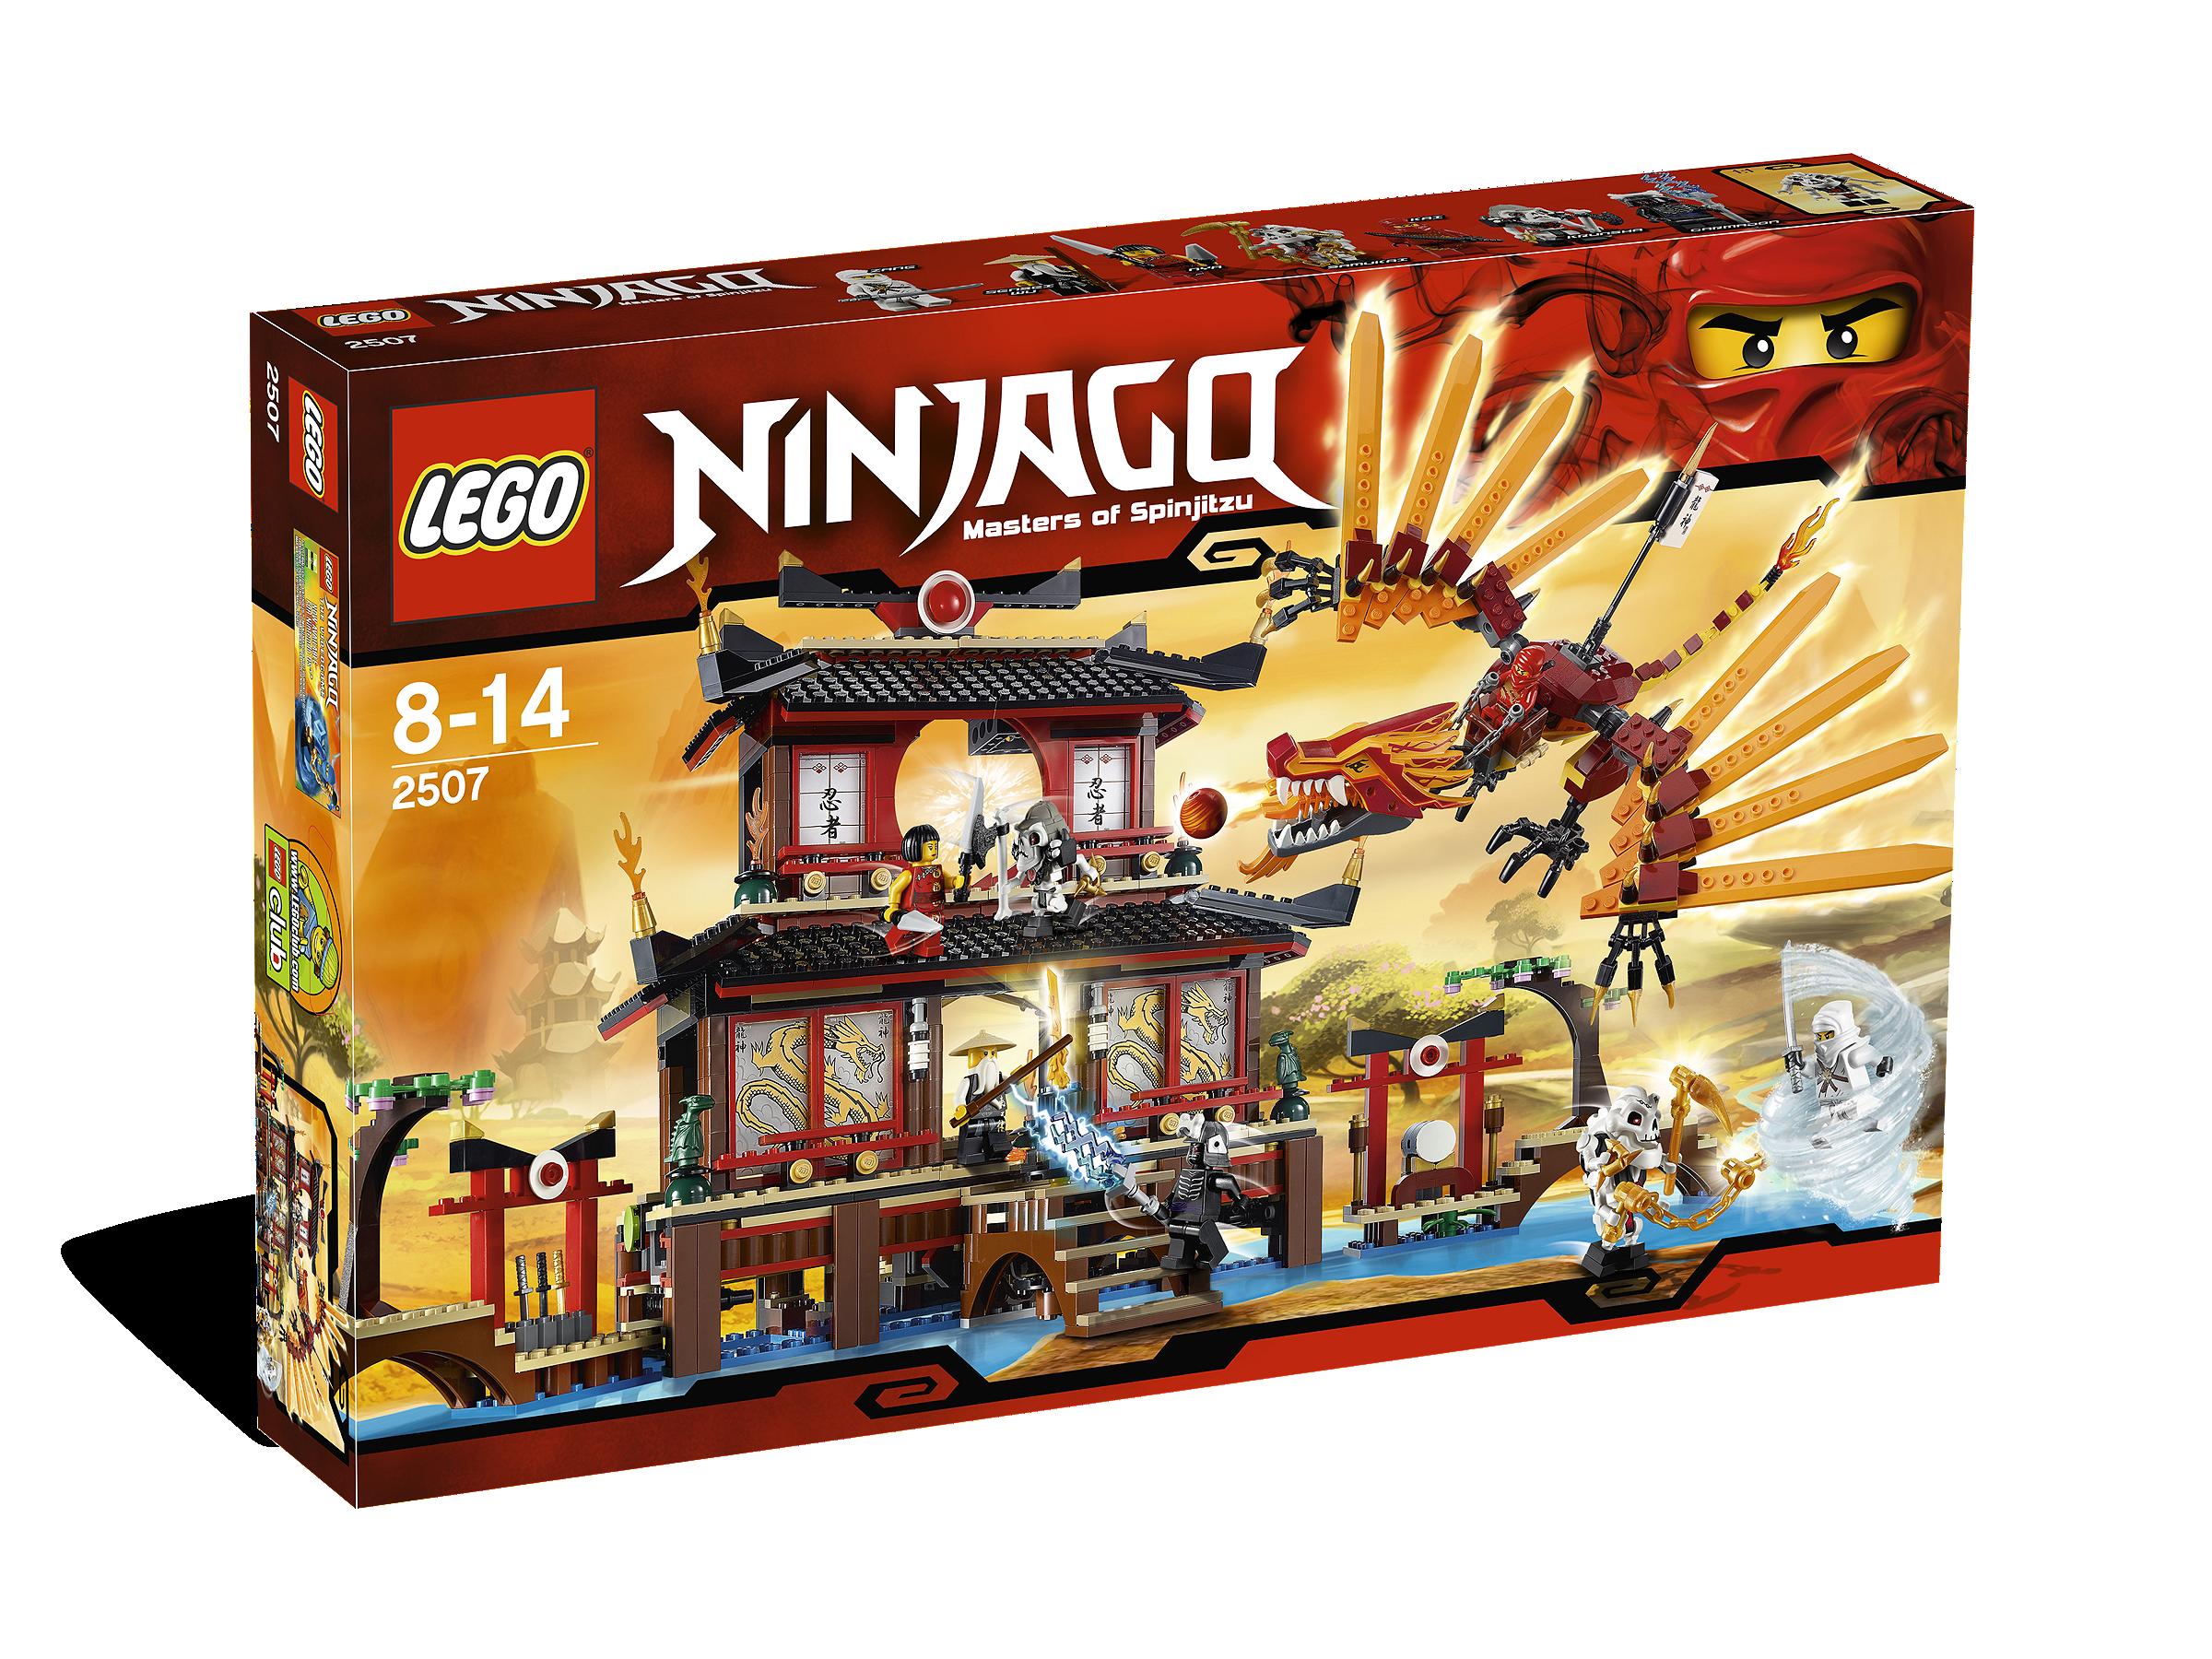 2507 Fire Temple